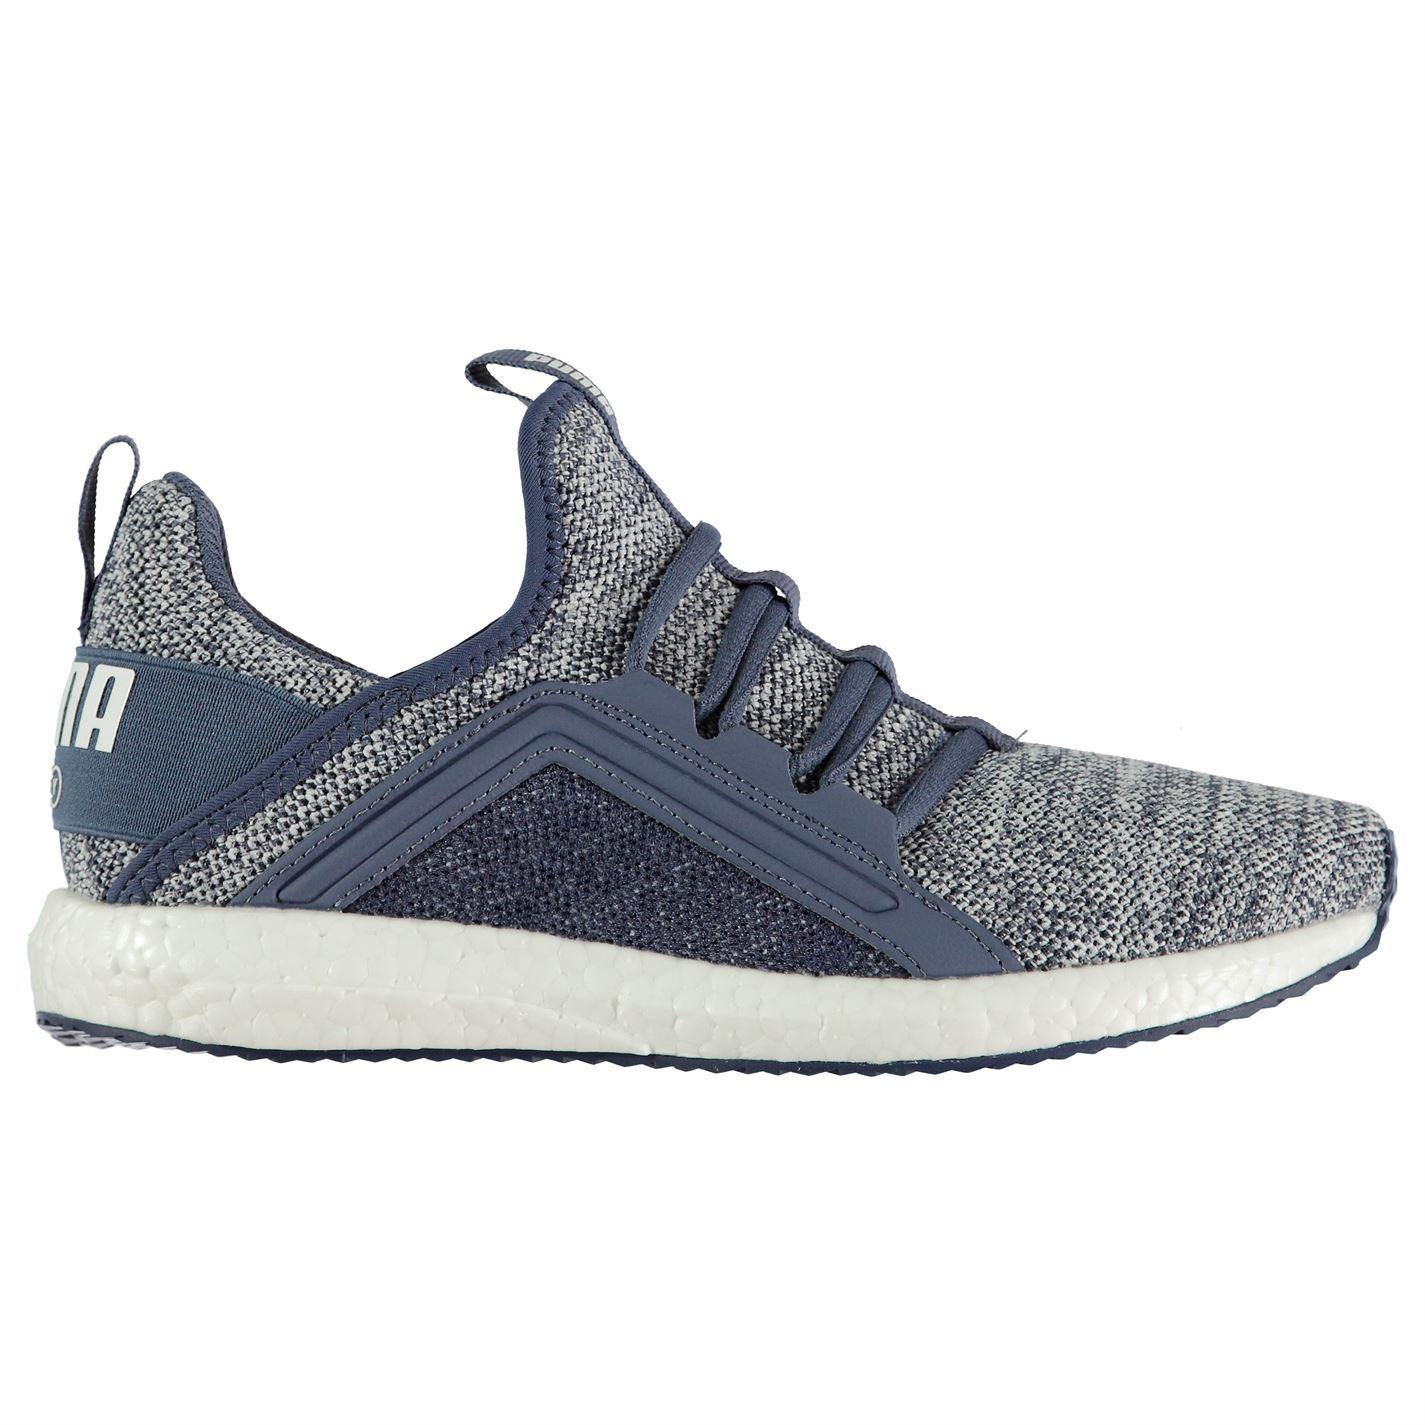 912a35b39d6f11 ... Puma Mega NRGY Knit Running Shoes Womens Blue Run Jogging Trainers  Sneakers ...